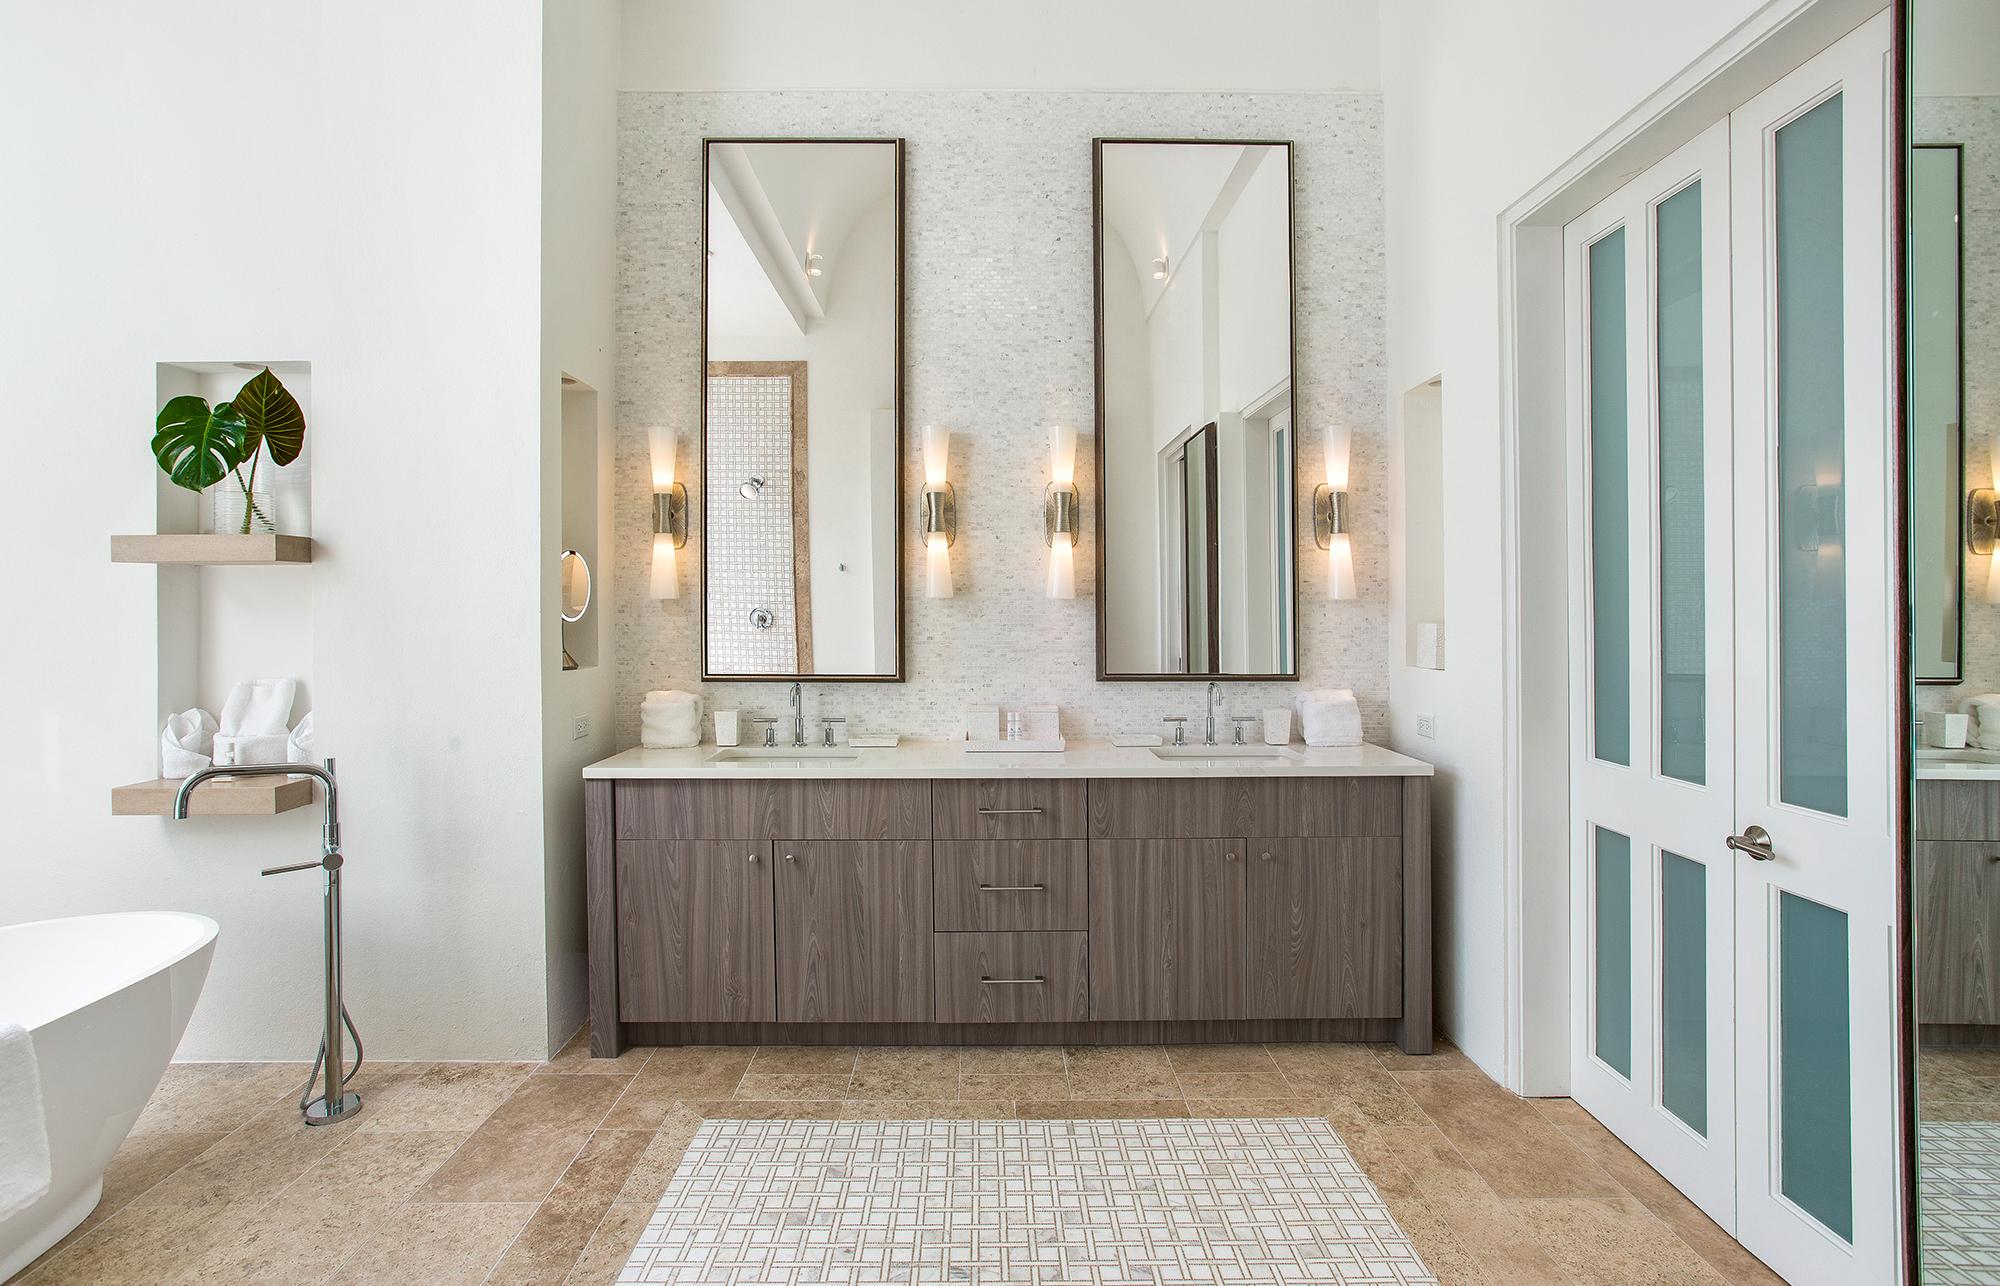 LongBay_0025_LongBay_0019_Bathroom 4.jpg